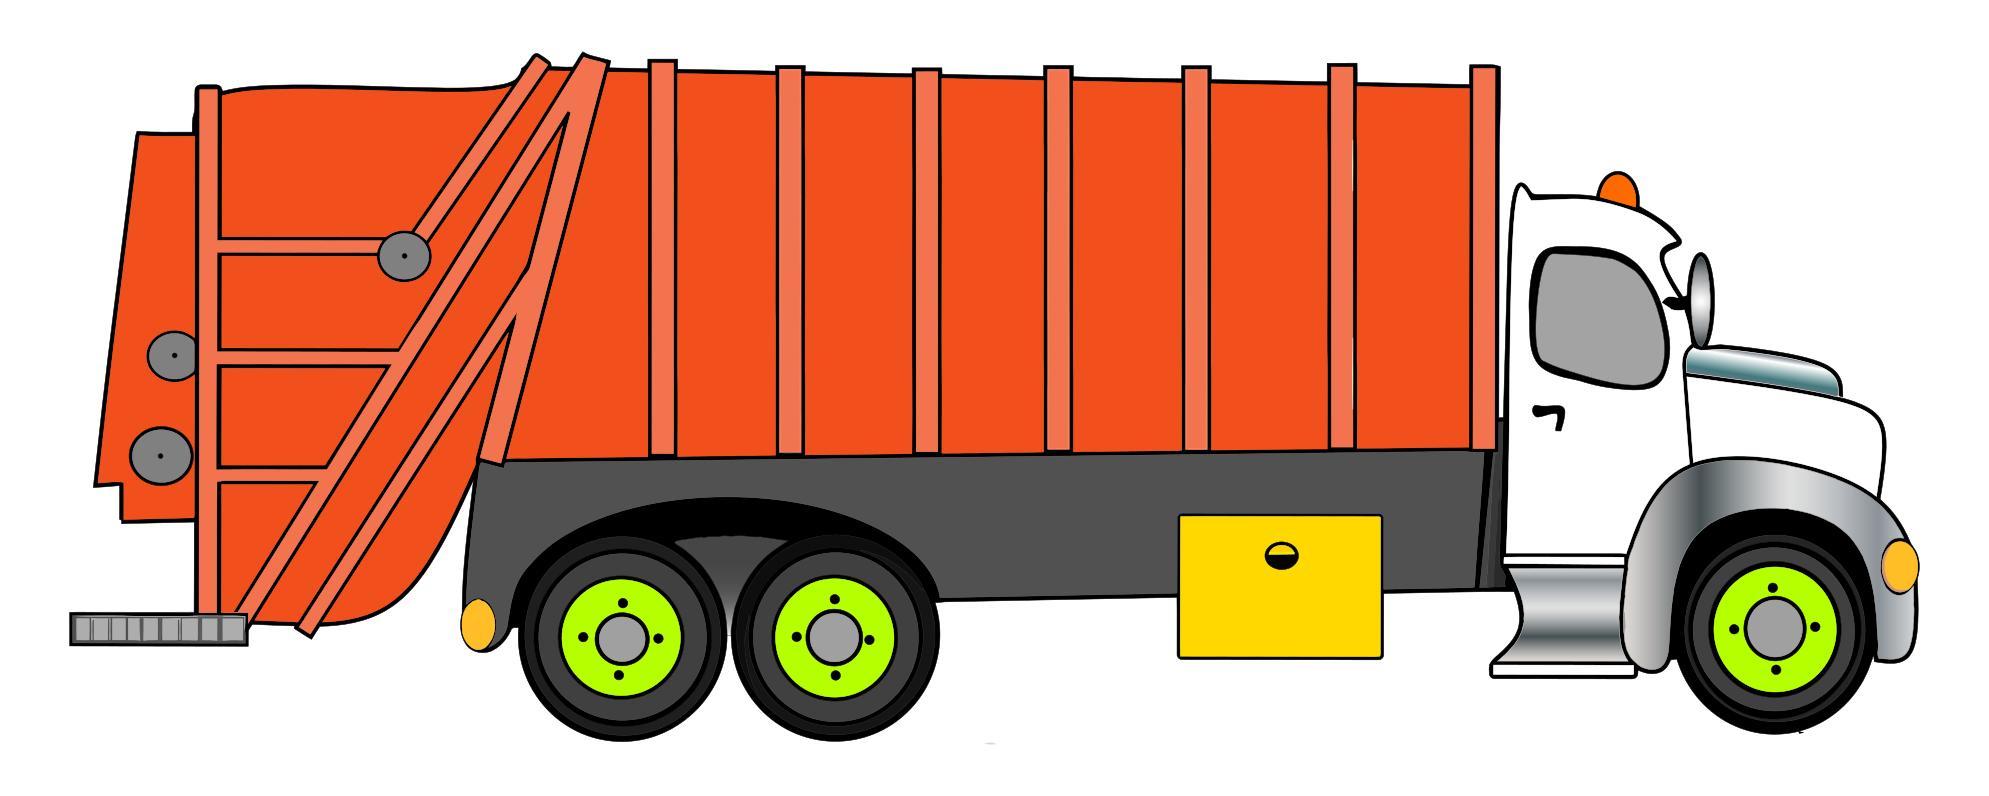 1989x796 Garbage Truck Clipart